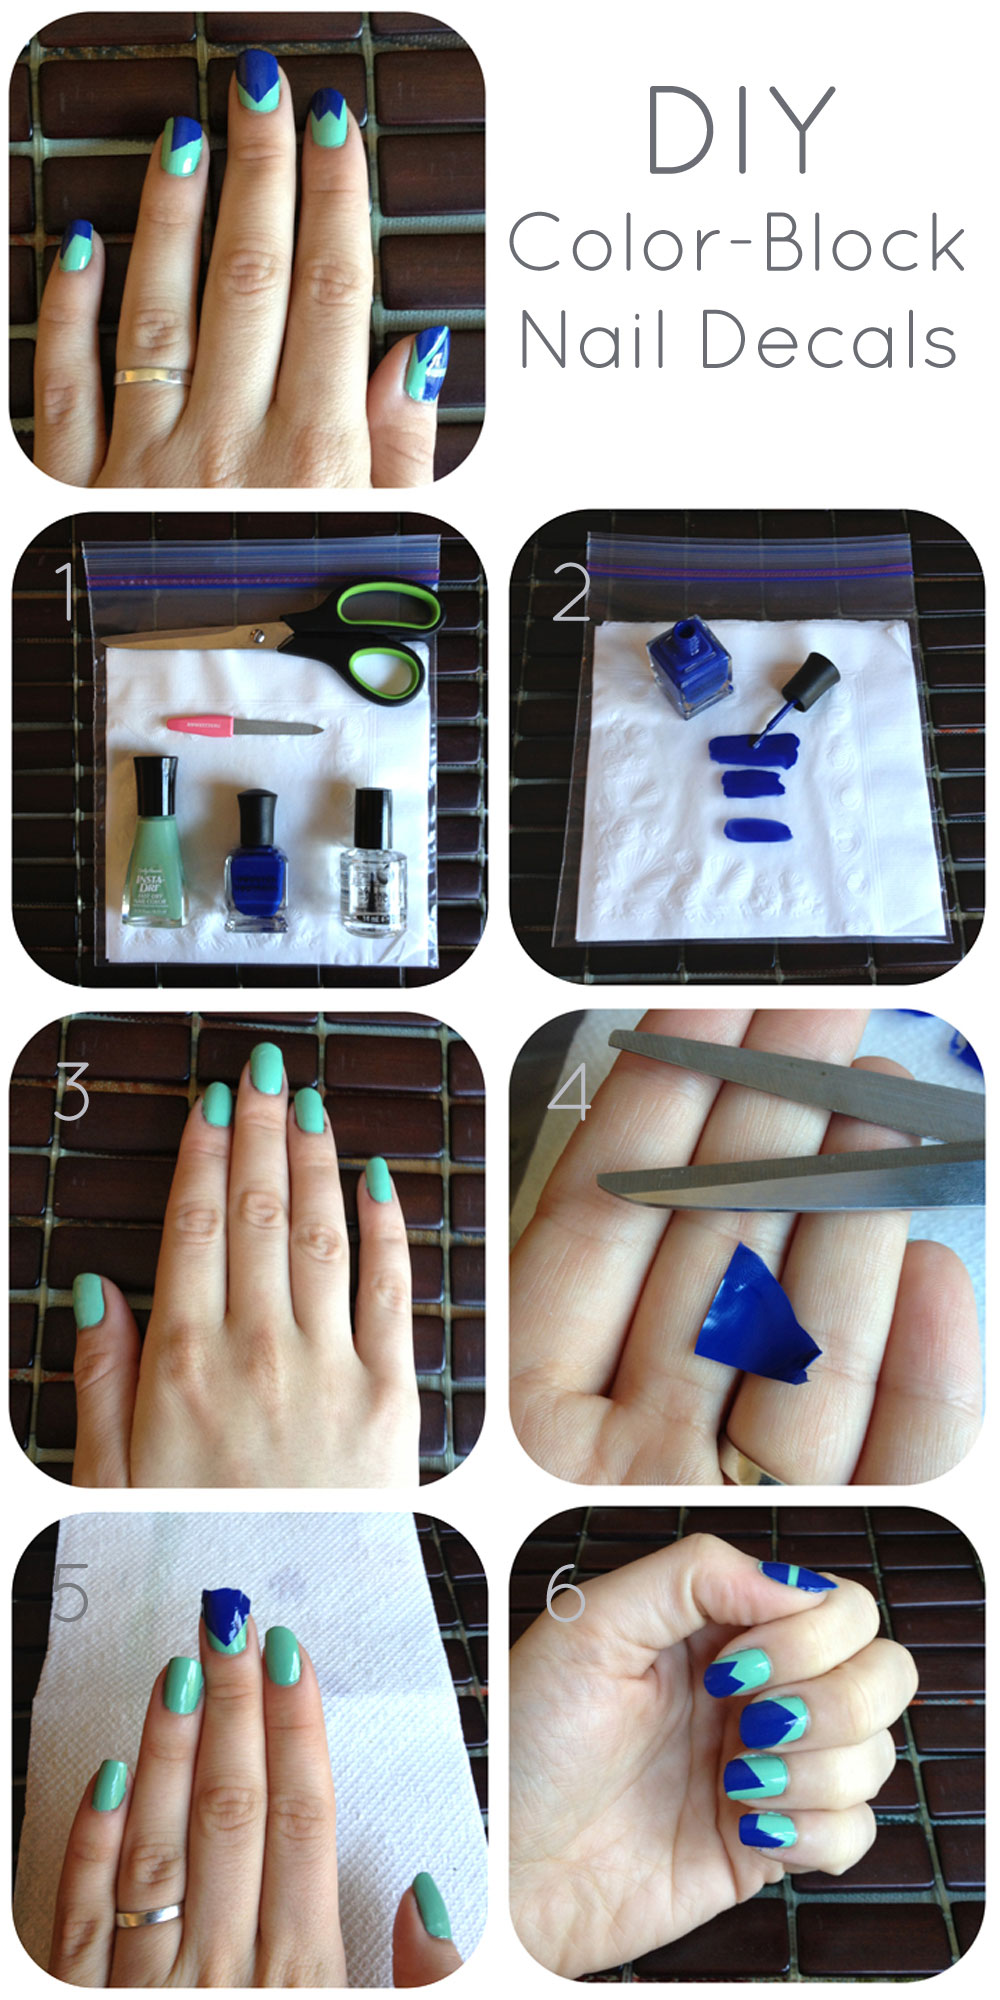 Fantastic diy color block nail designs solutioingenieria Choice Image